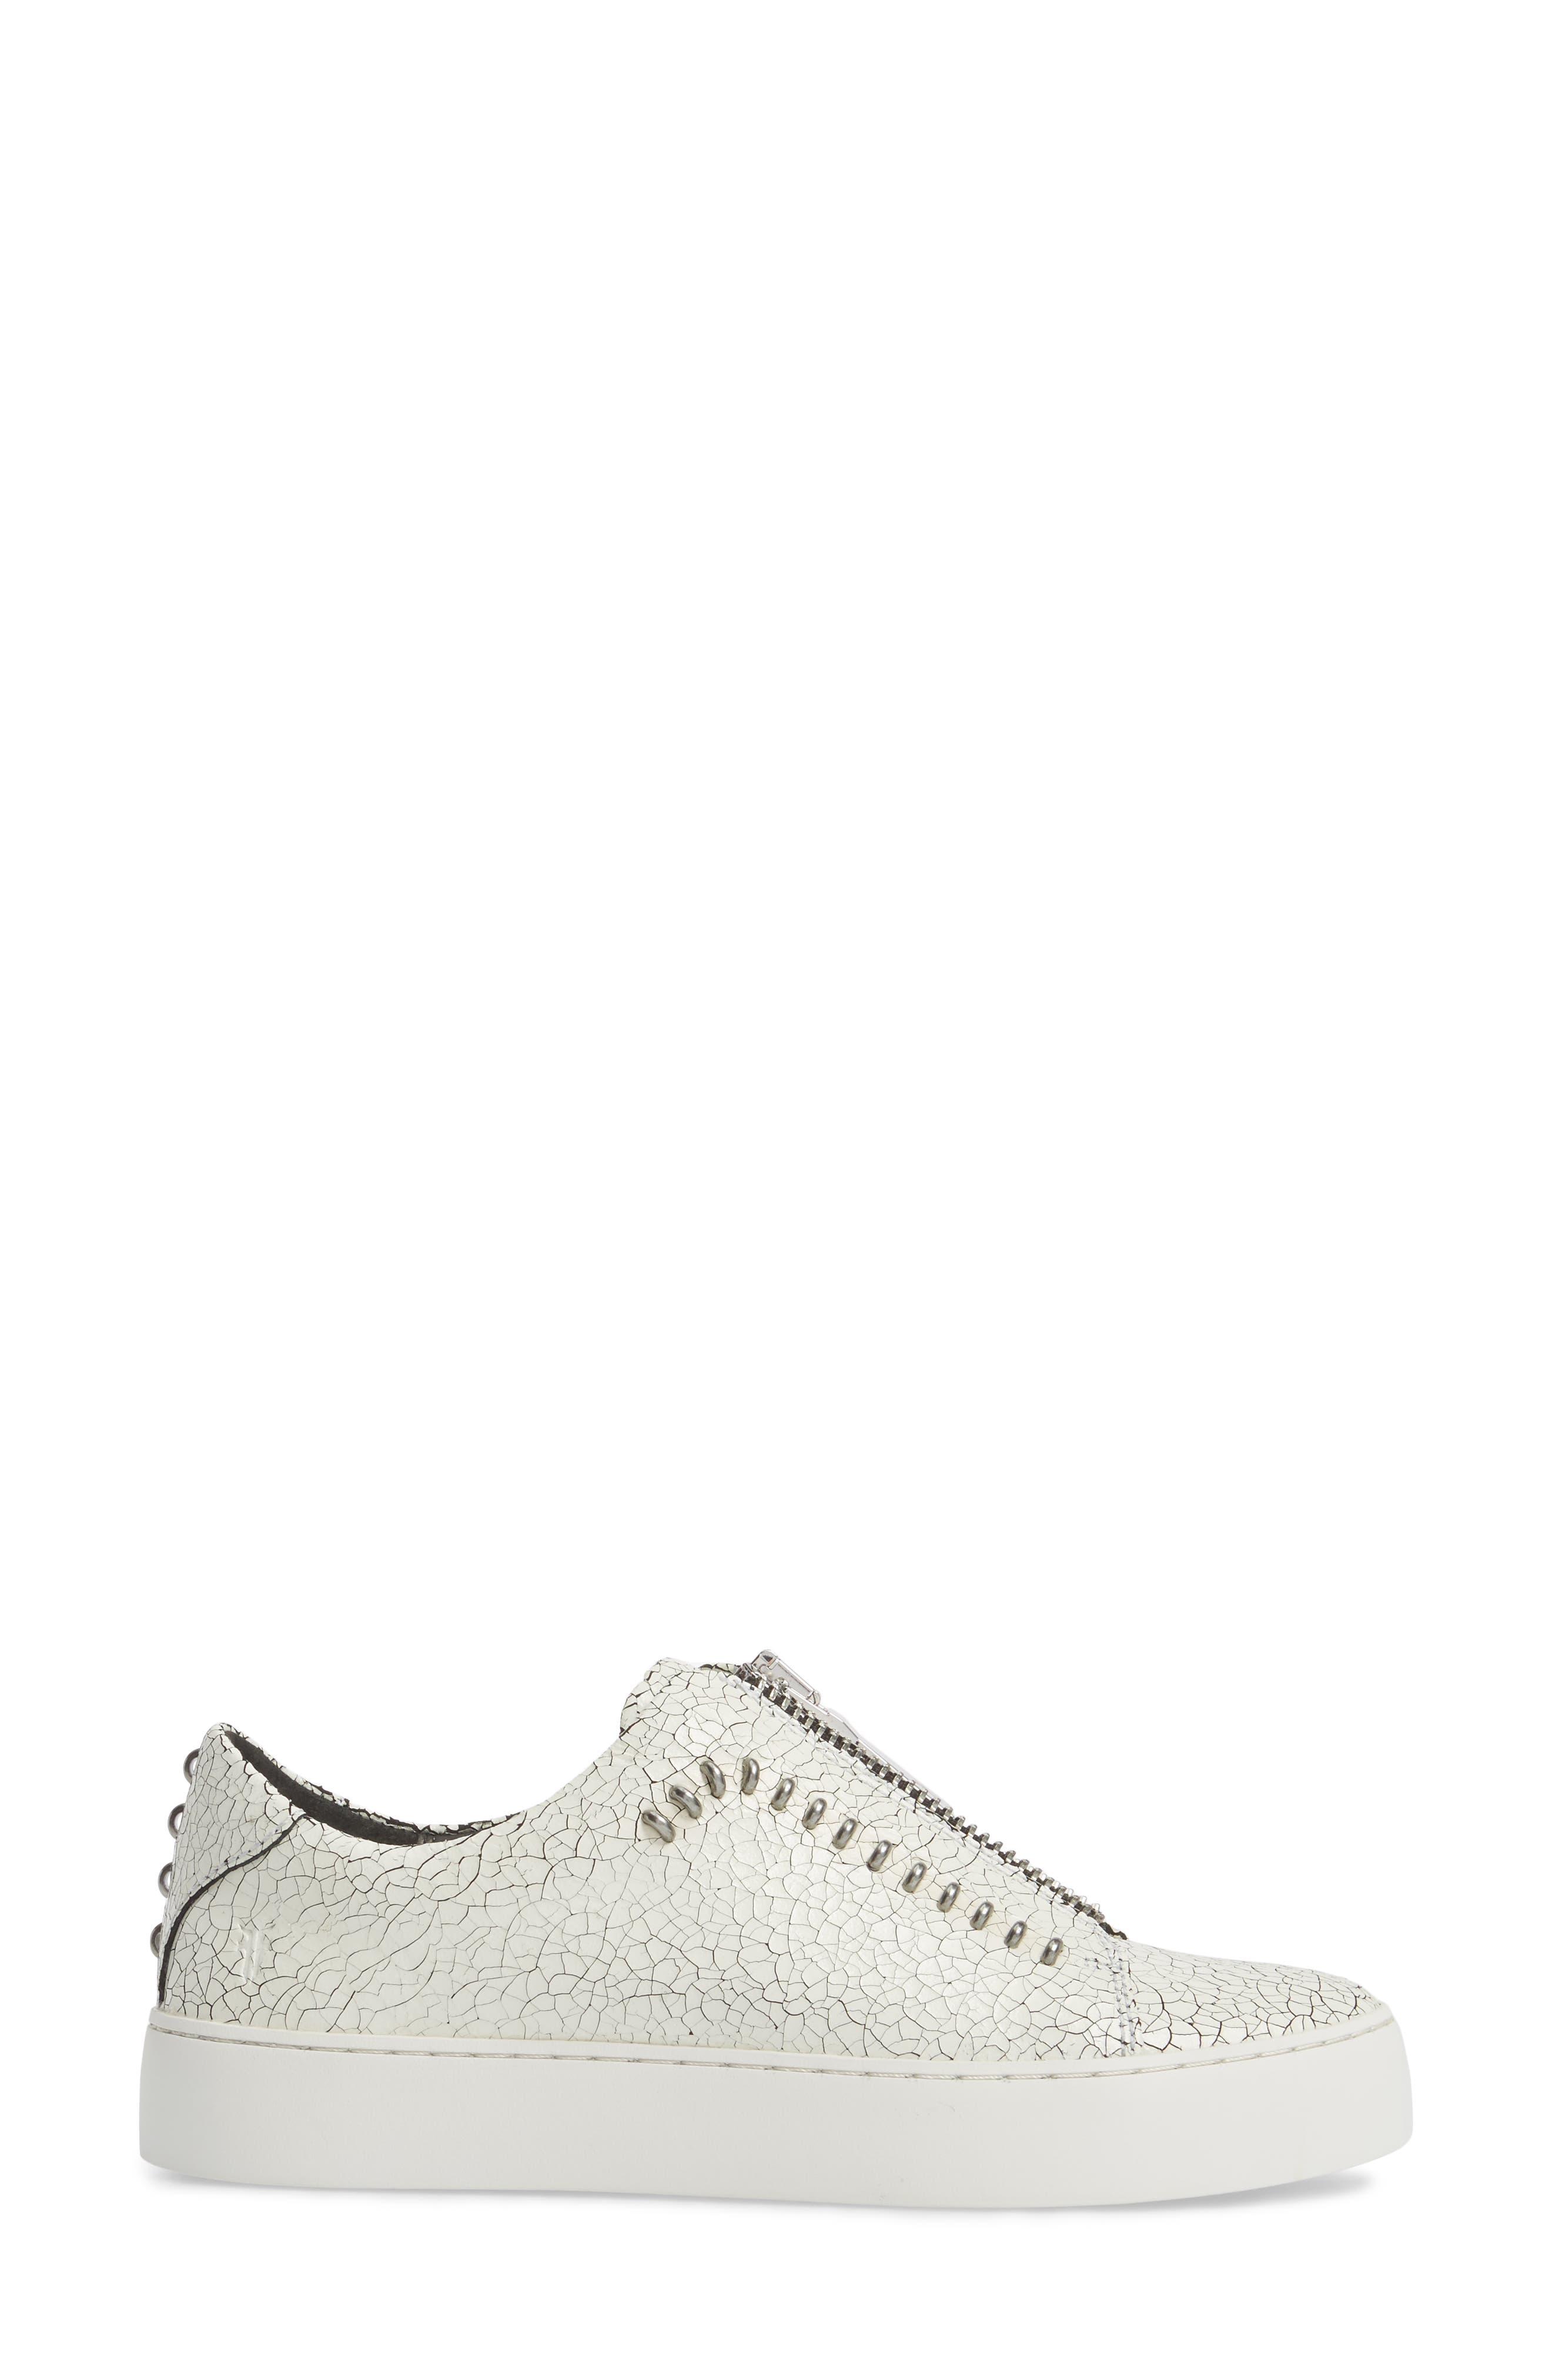 Lena Rebel Zip Sneaker,                             Alternate thumbnail 3, color,                             White Leather